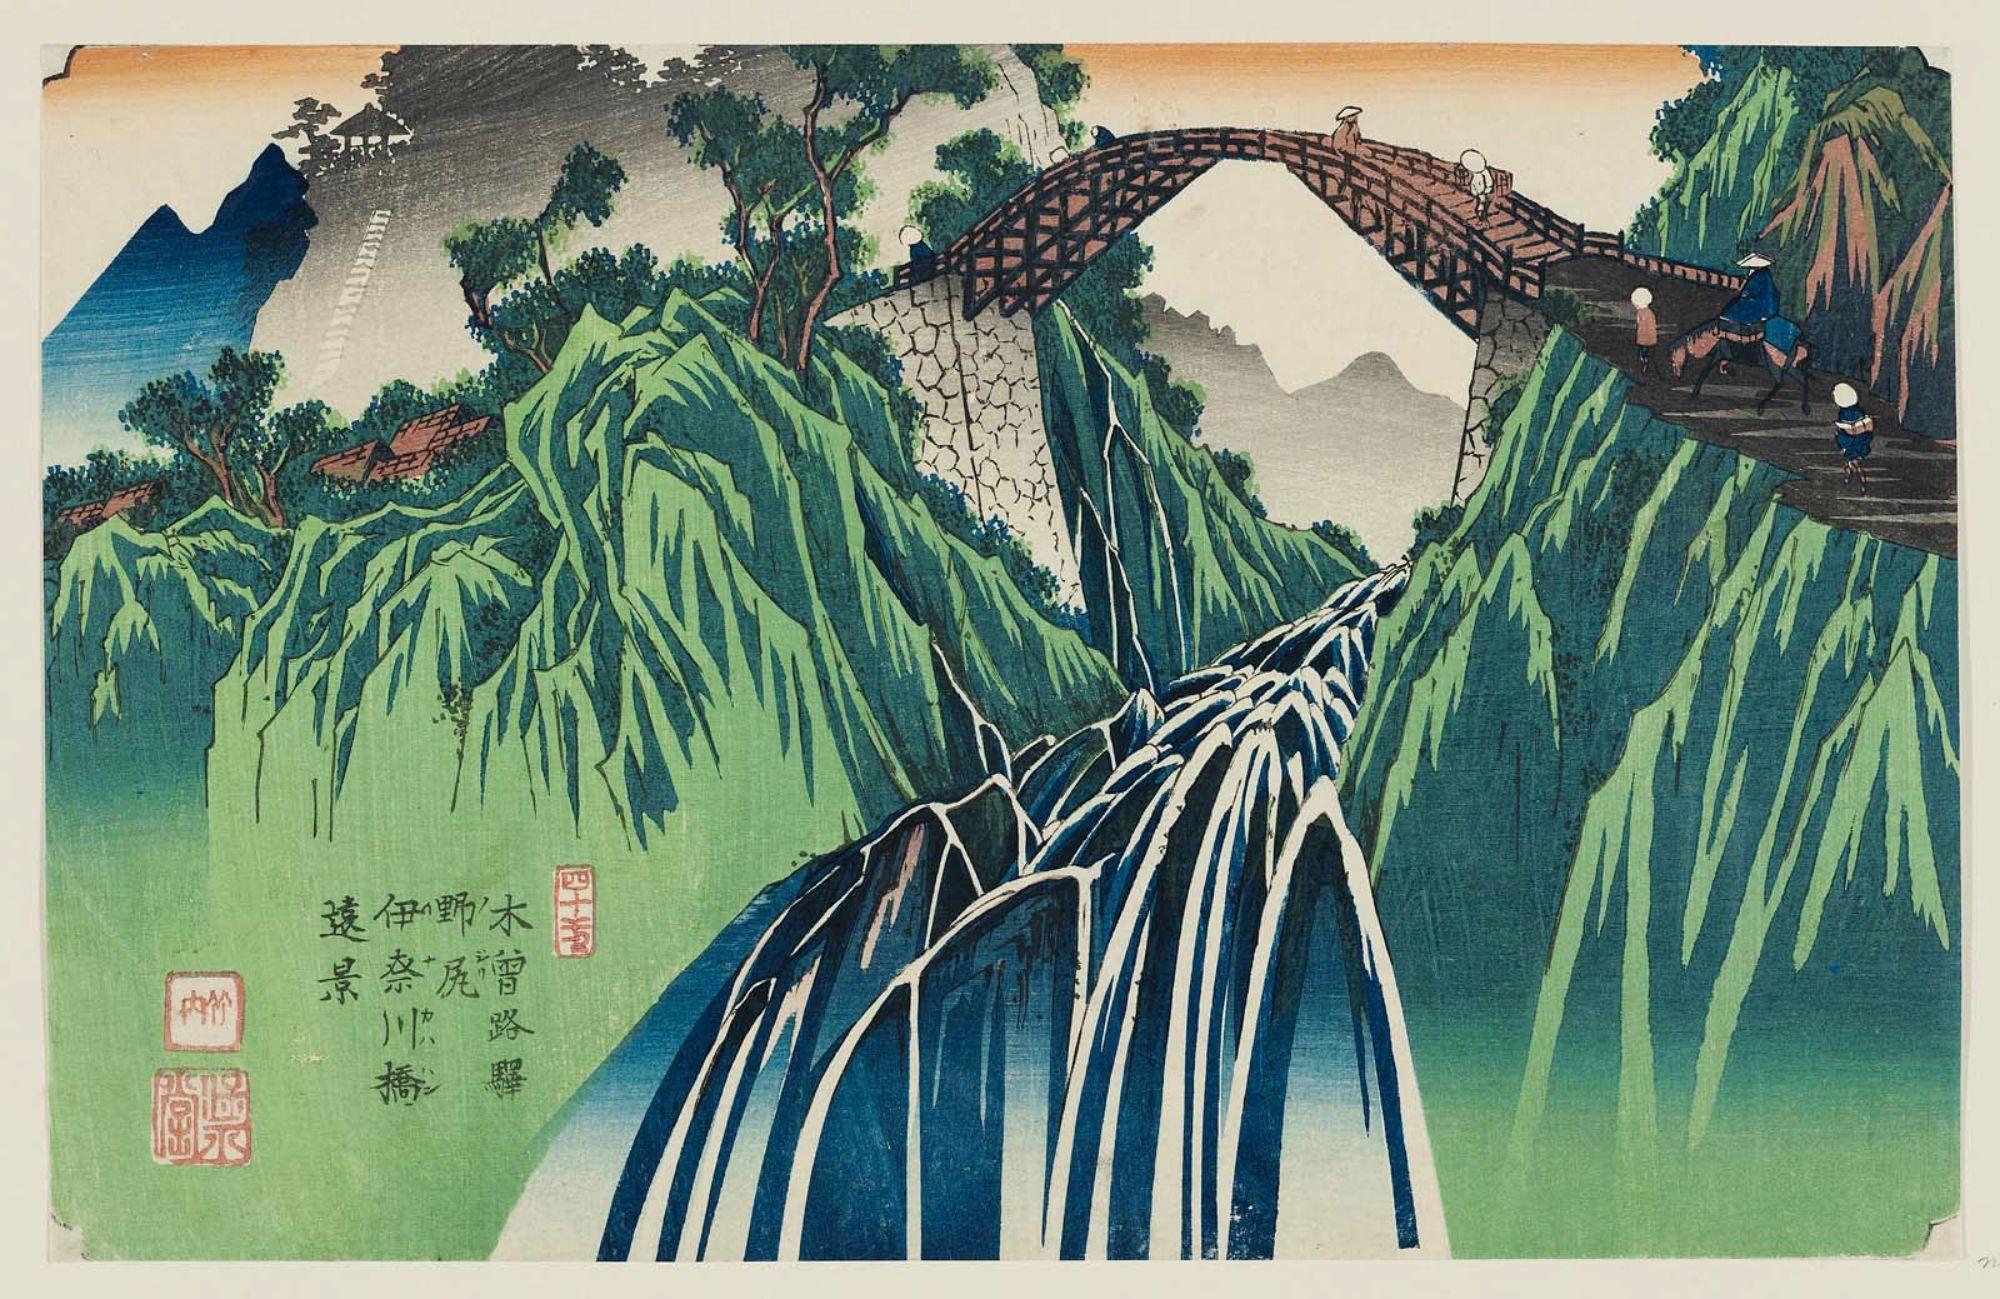 https://data.ukiyo-e.org/mfa/images/sc207596.jpg